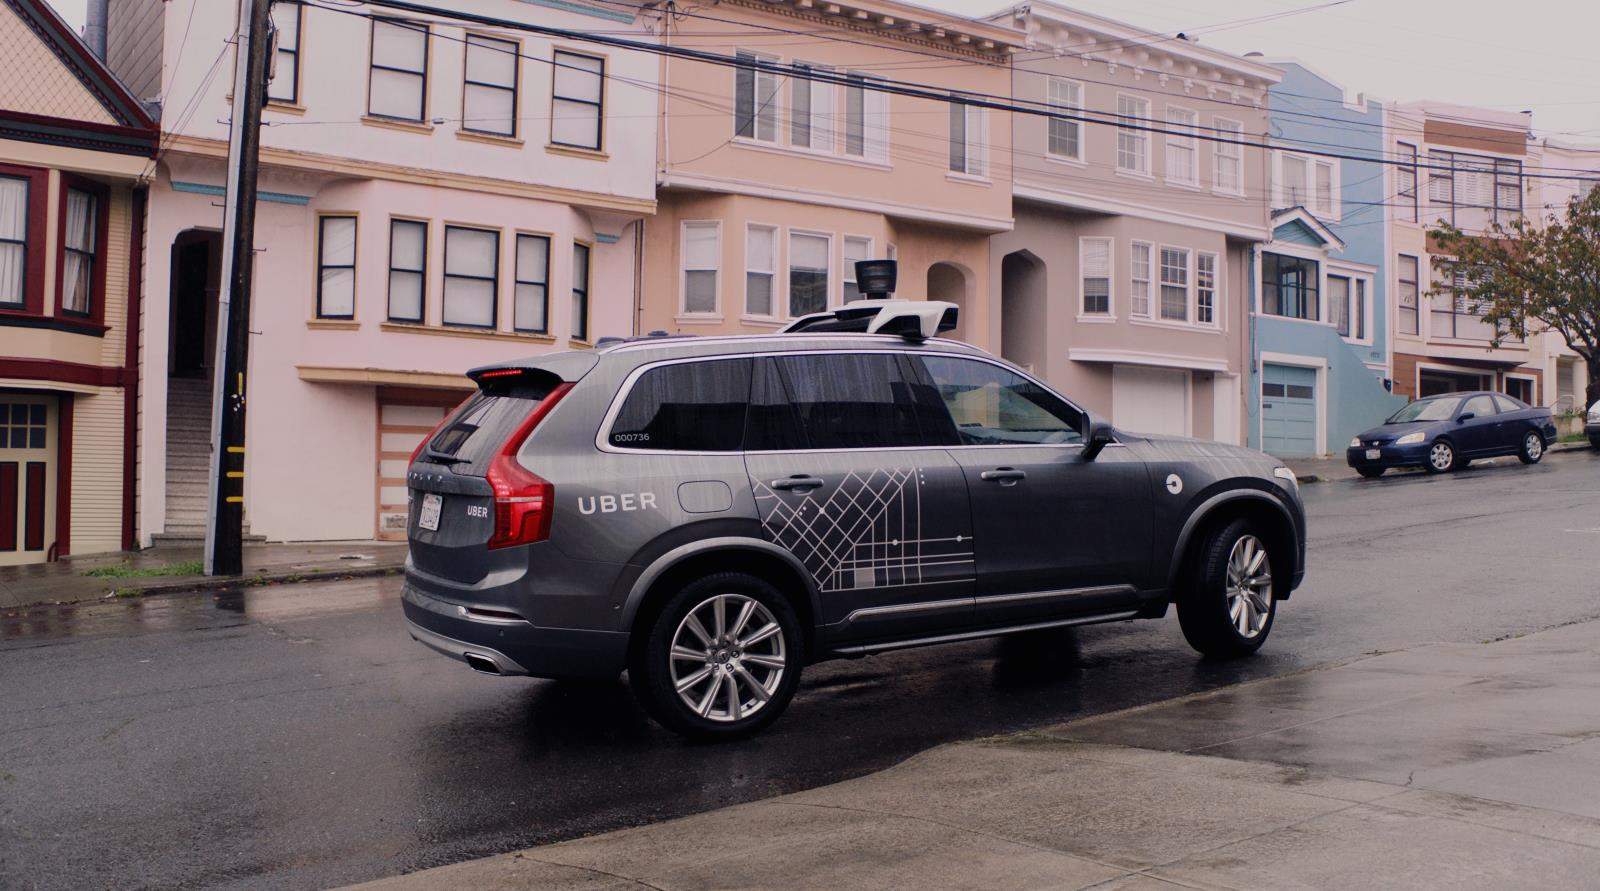 Uber autonomous Volvo in San Francisco